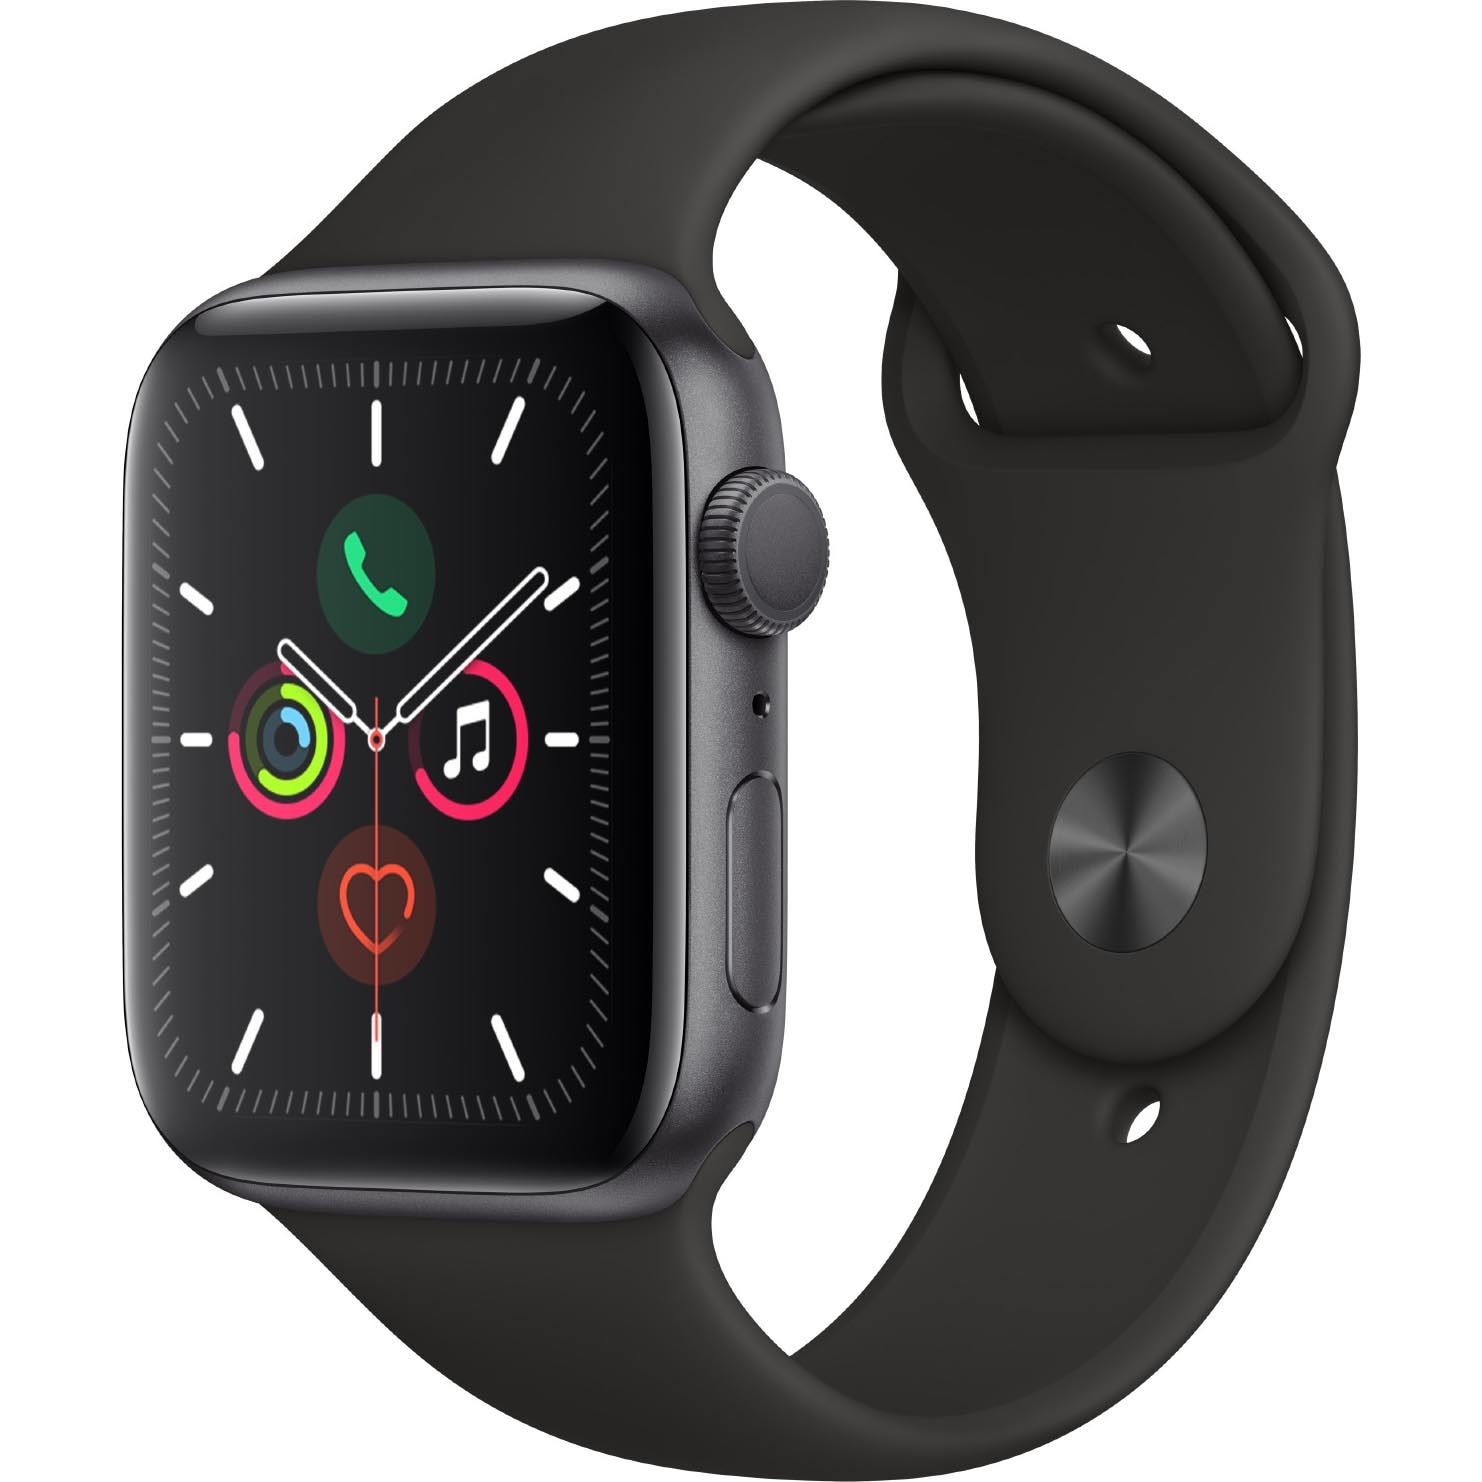 Fotografie Apple Watch 5, GPS, Carcasa Space Grey Aluminium 40mm, Black Sport Band